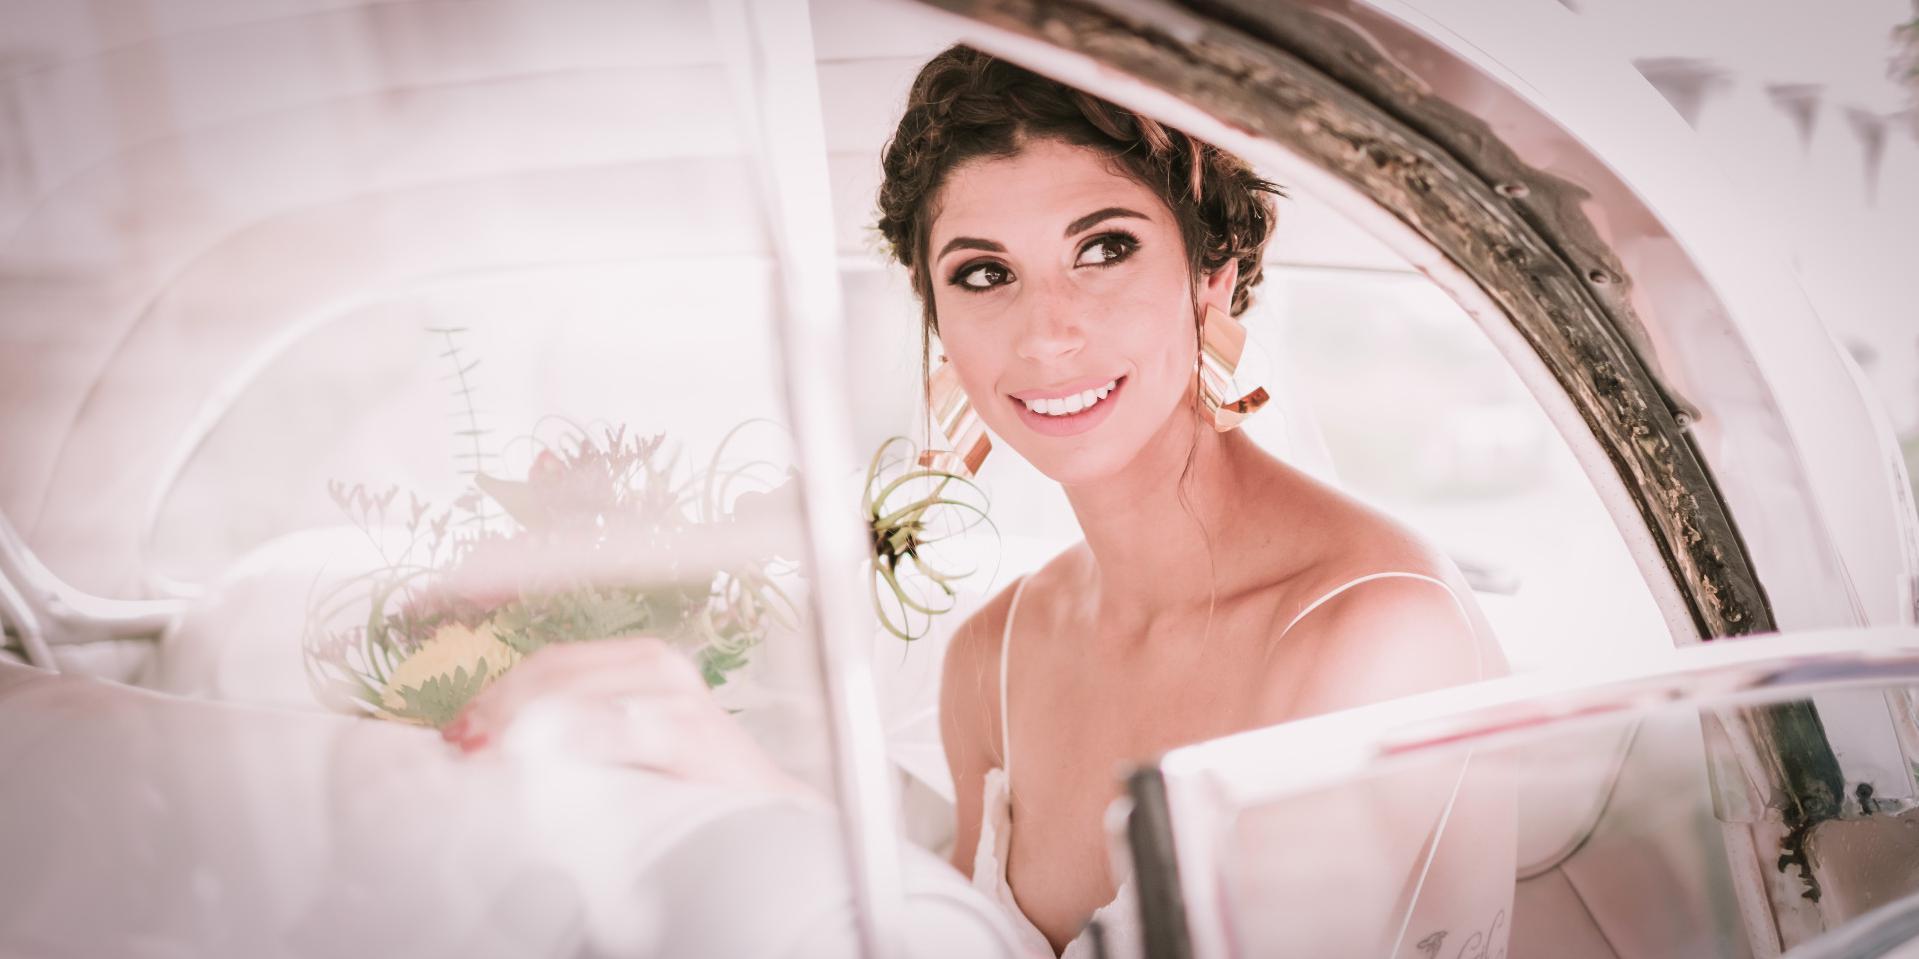 bodas-sin-clasificar-sin-tema-cuba-29261.jpg